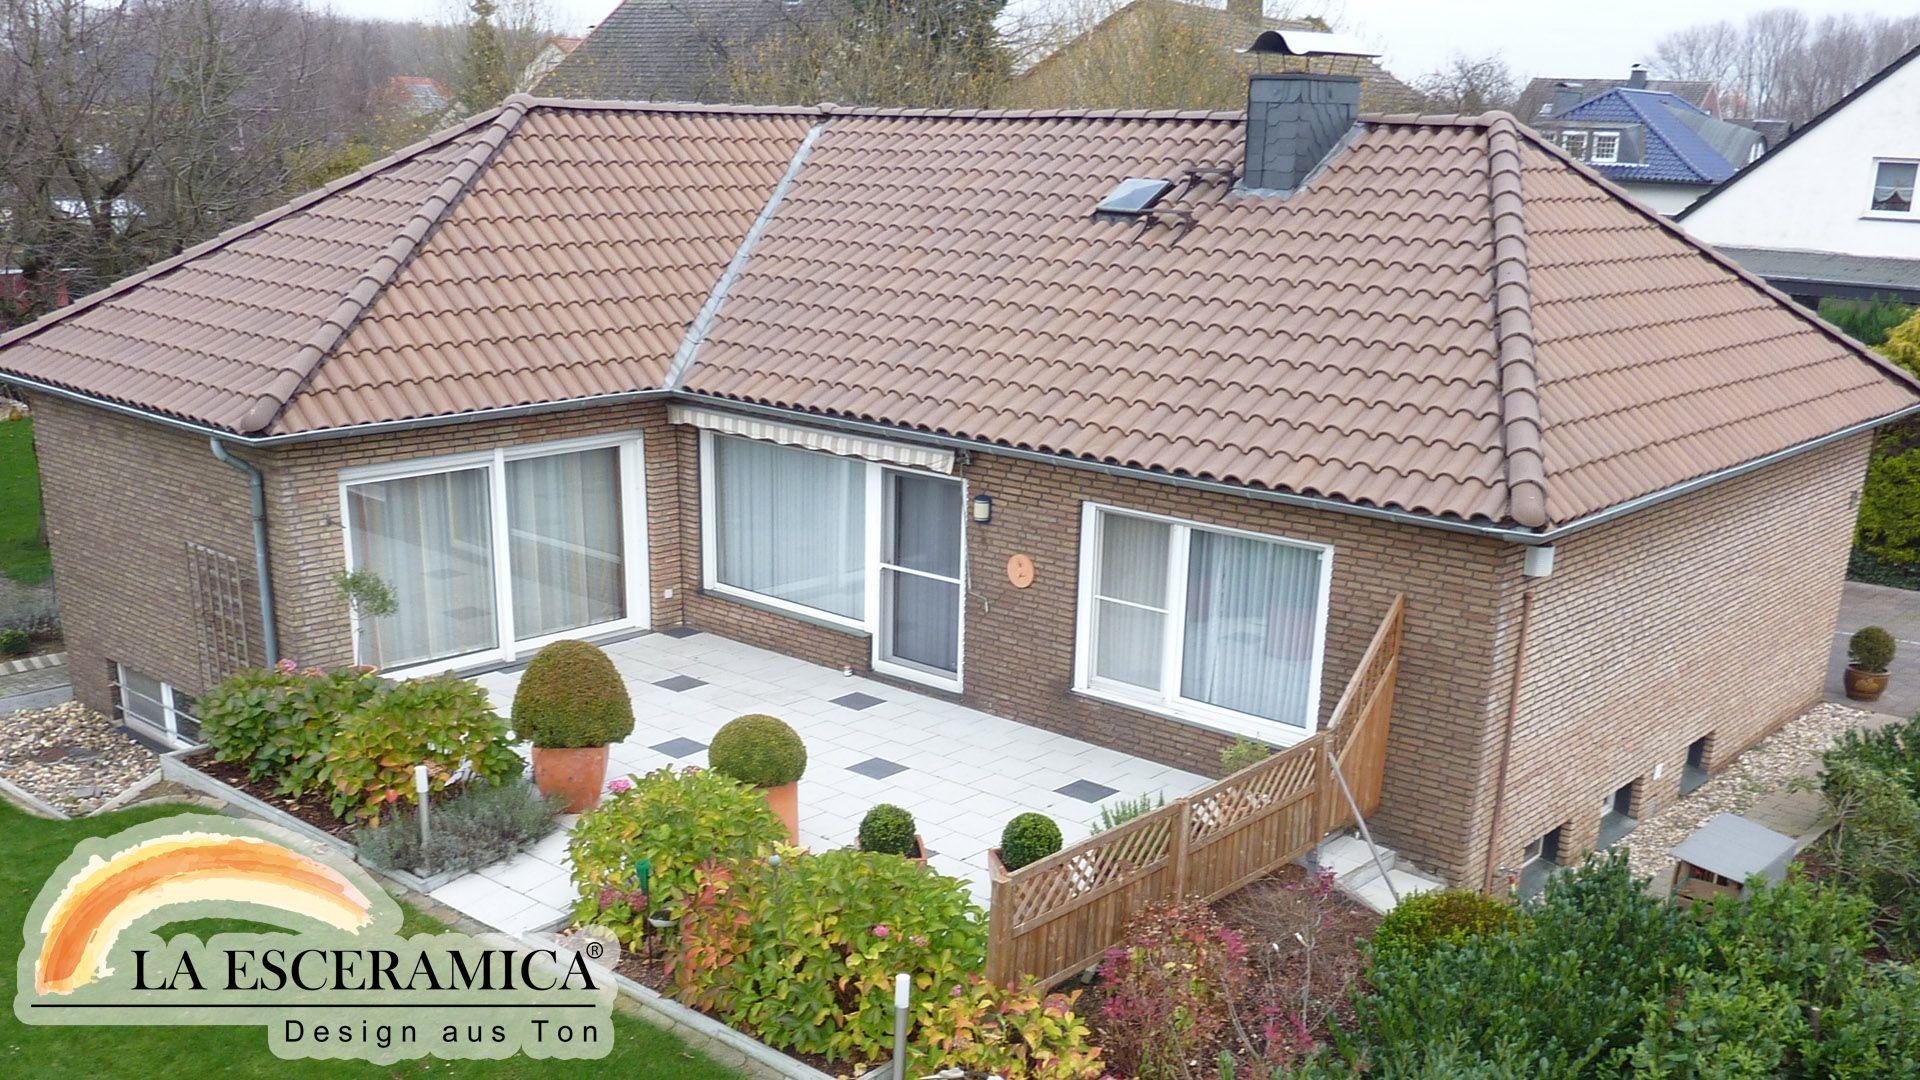 Fassadenfarbe mediterran braun  La Esceramica Dachziegel Farbe Braun | Dachziegel | Pinterest ...